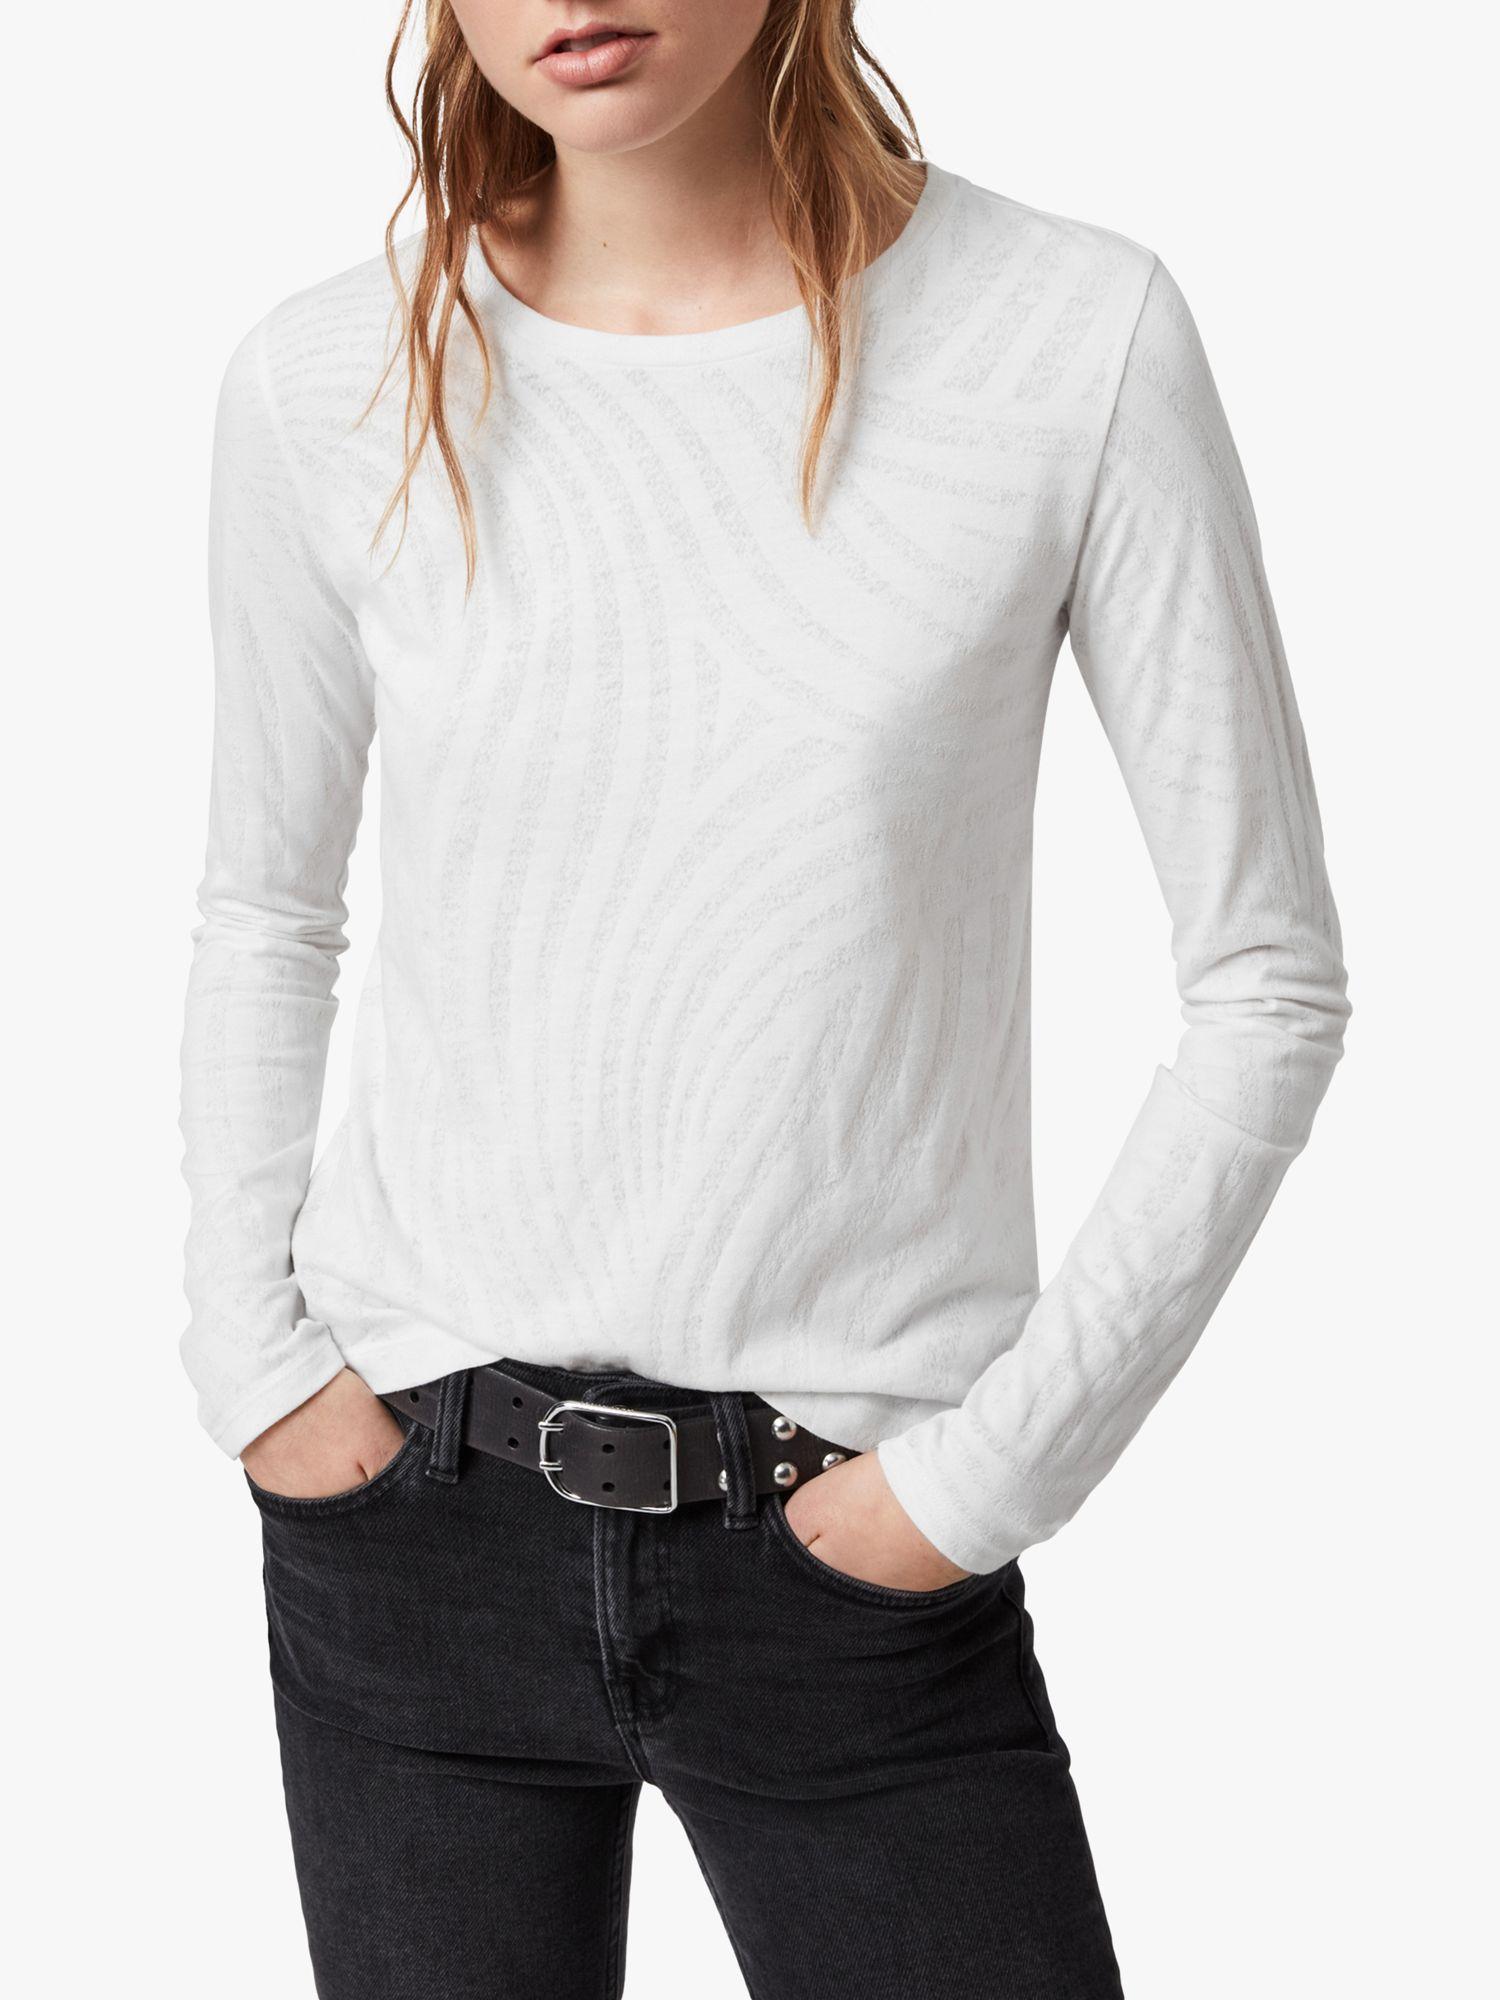 AllSaints AllSaints Zake Esme Long Sleeve T-Shirt, Smog White